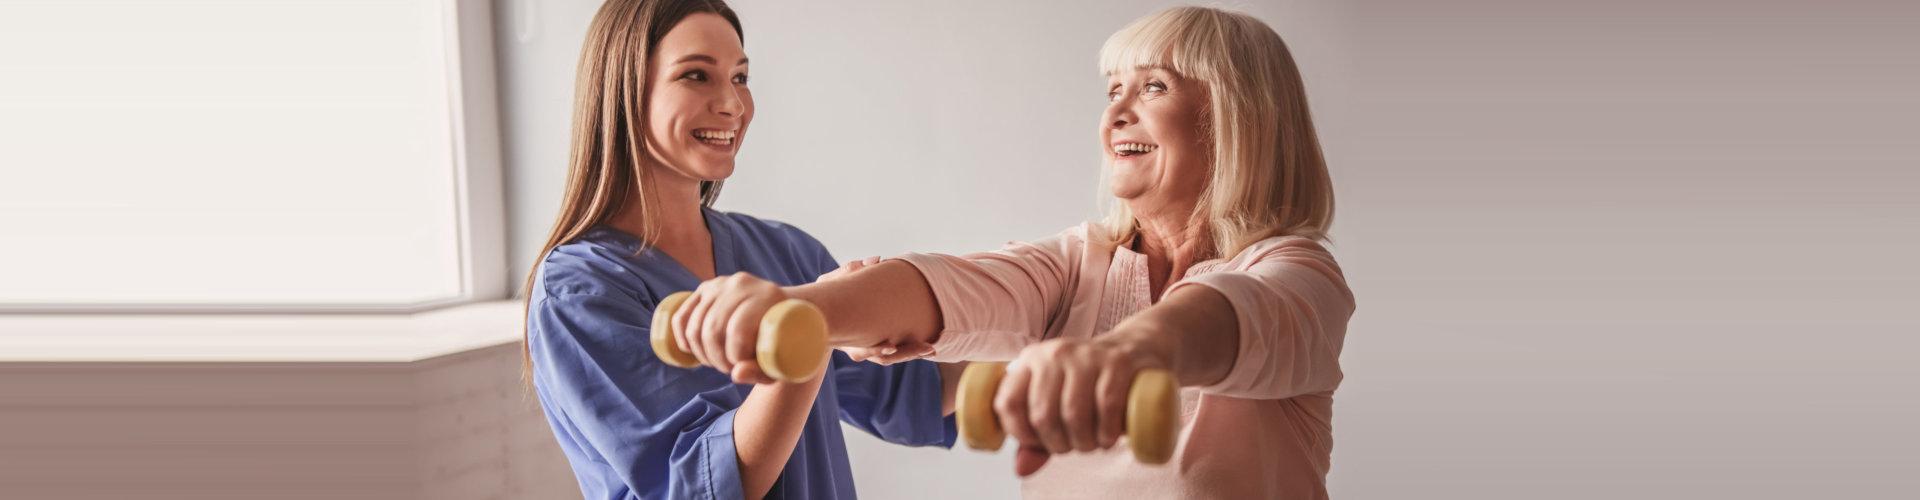 caregiver helping elder woman on exercising